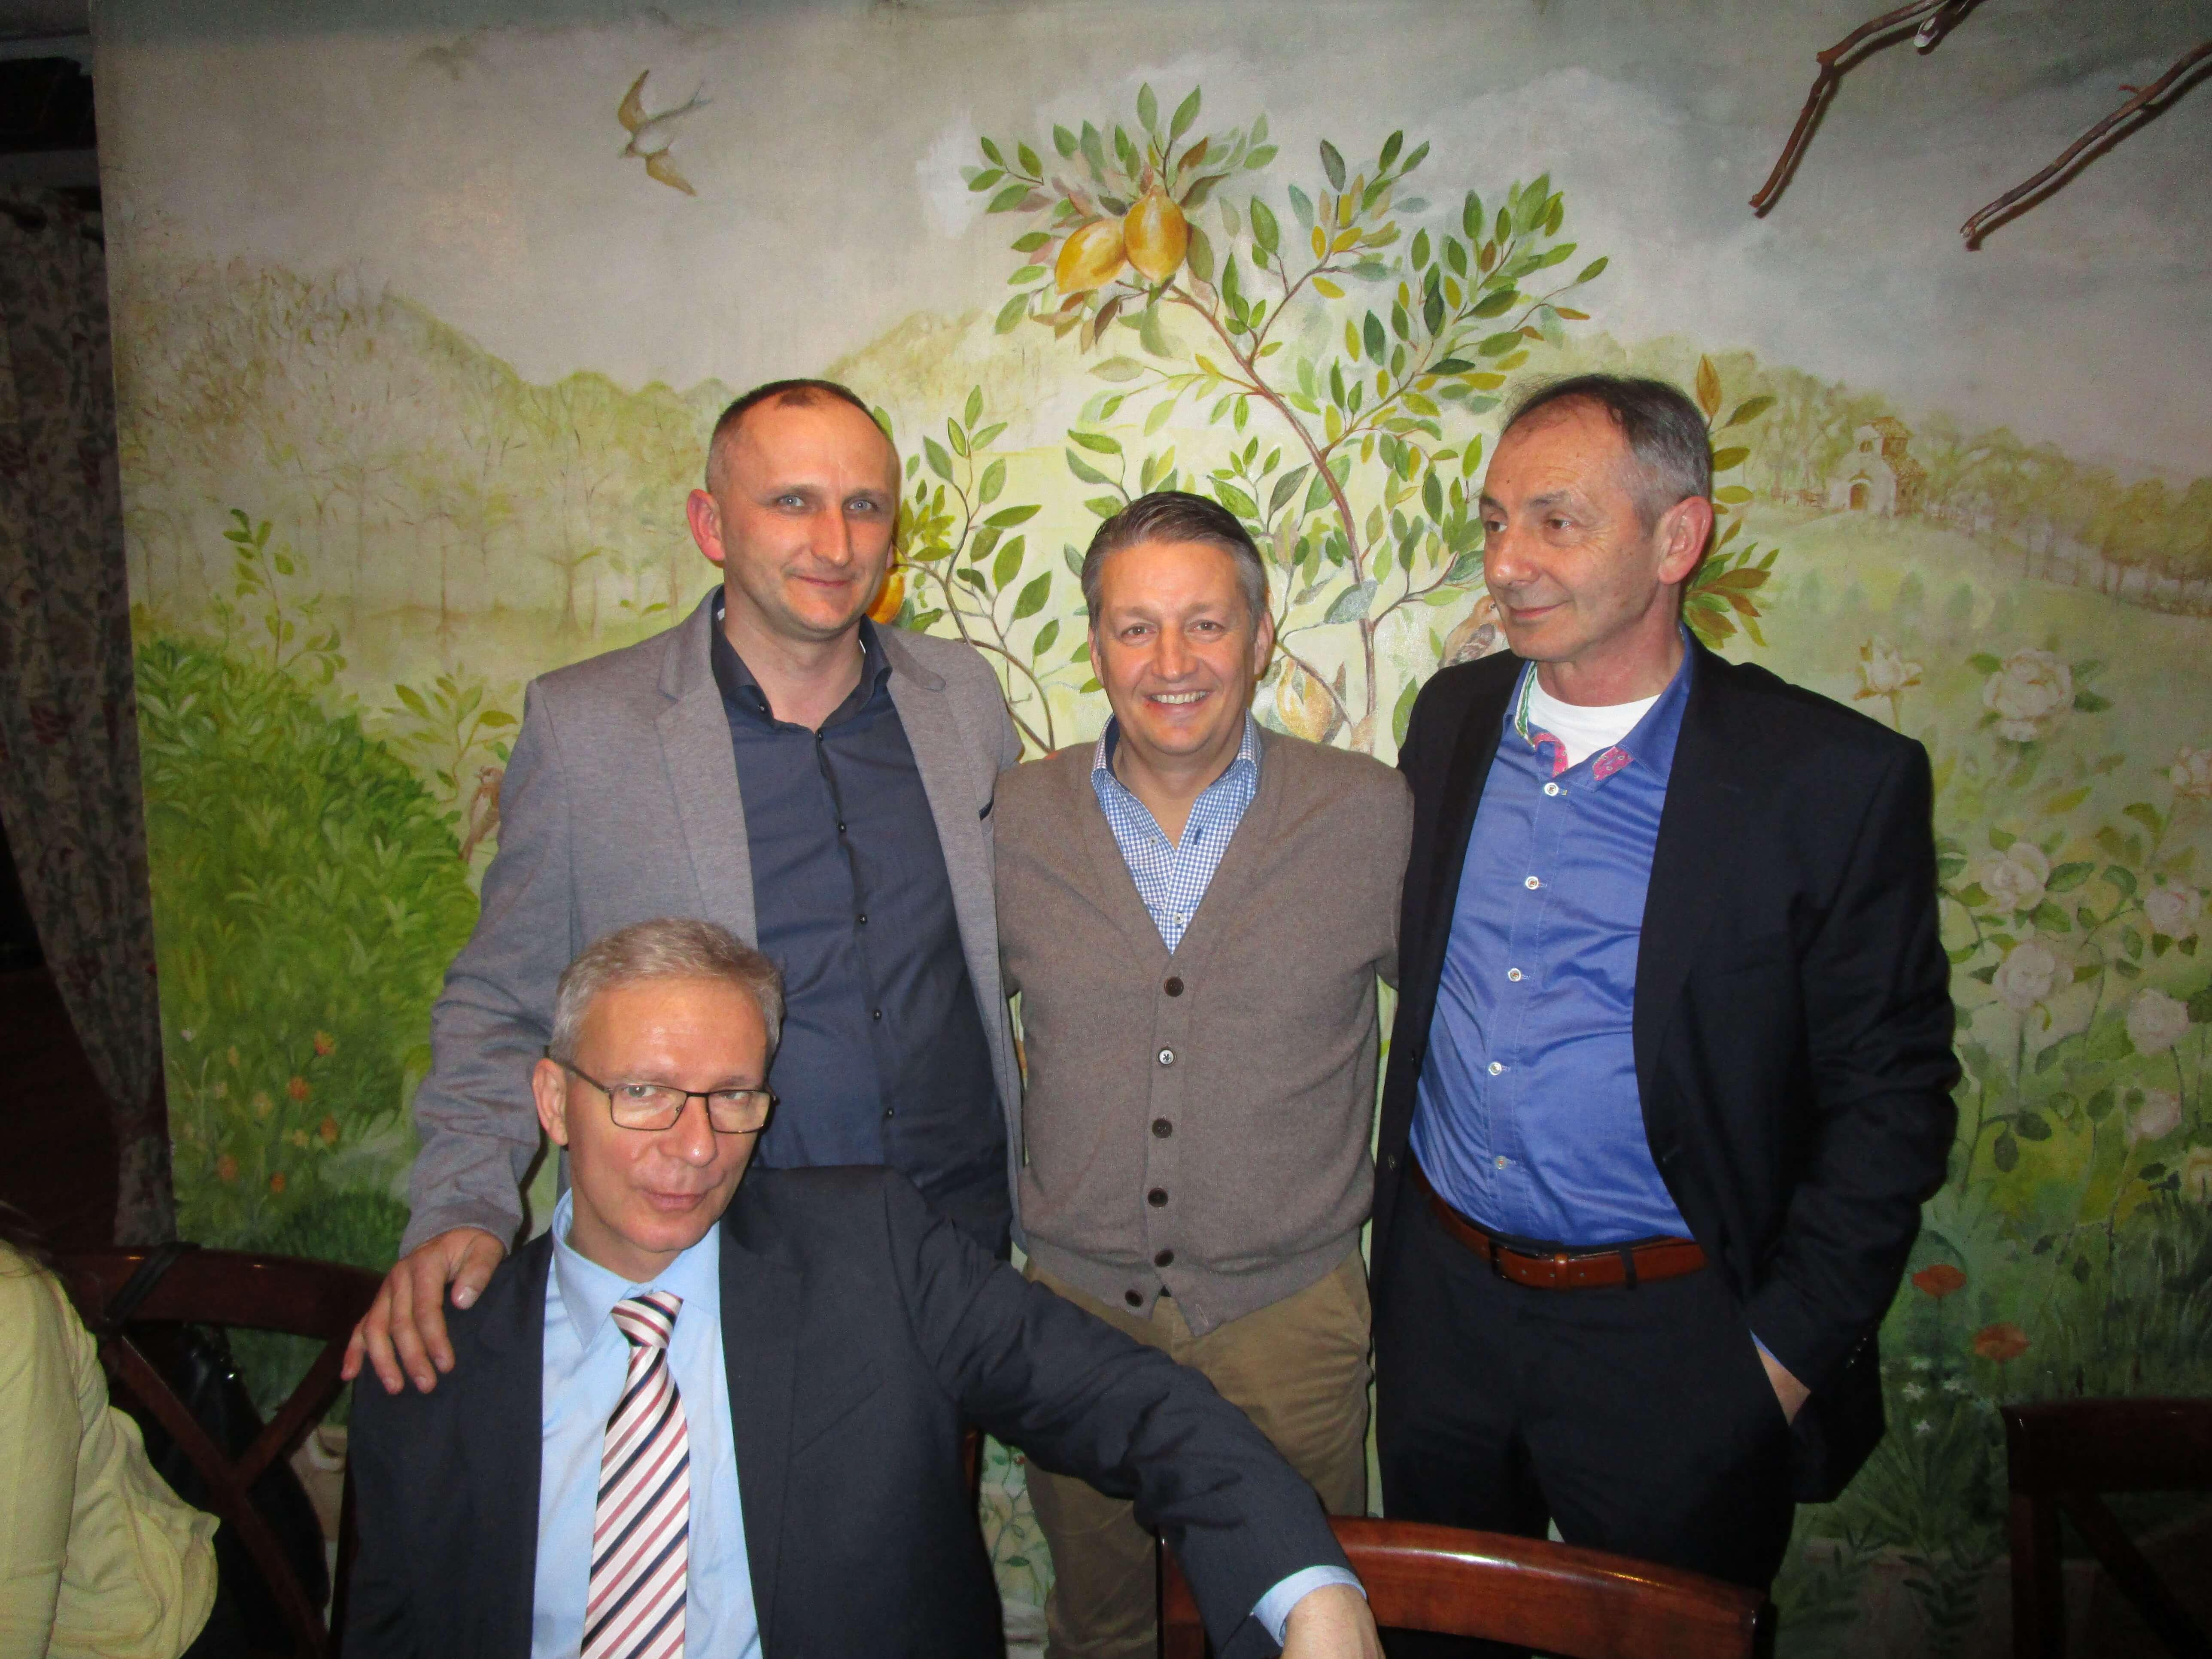 Verleger-Krystian-Kidala-und-Henryk-Jokiel_tiny